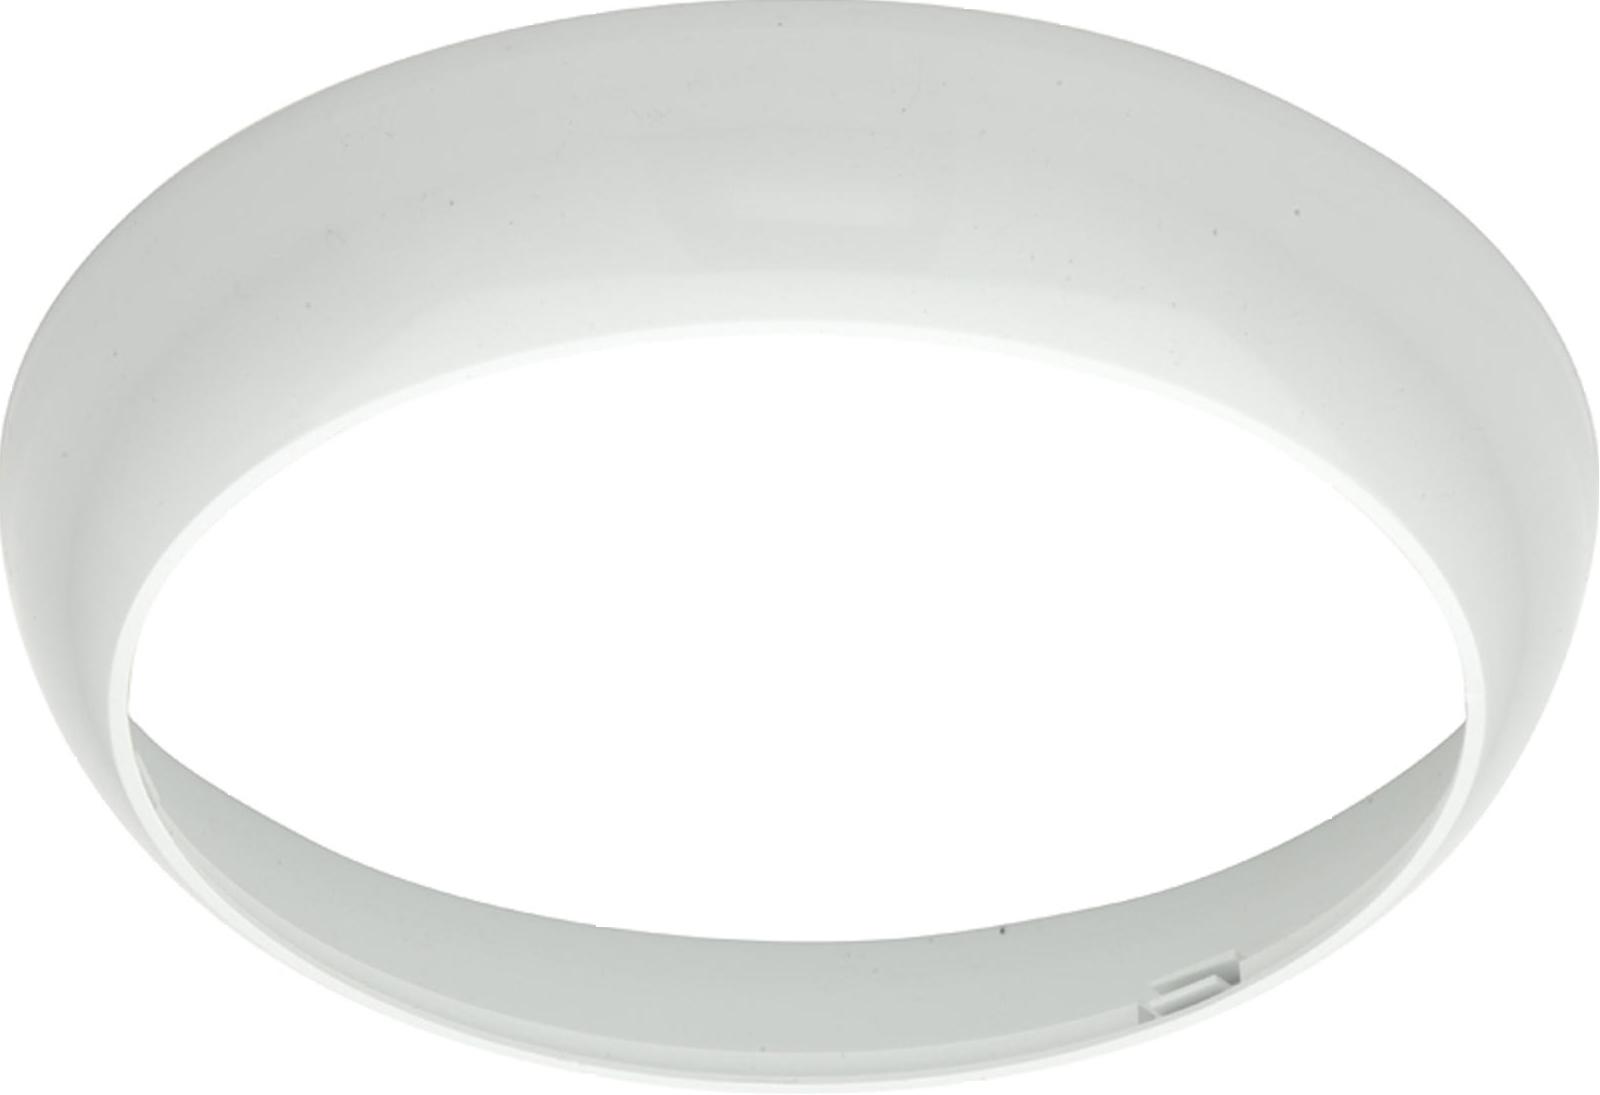 White Trim for TPB14, TPB28 and TPB38 Bulkheads